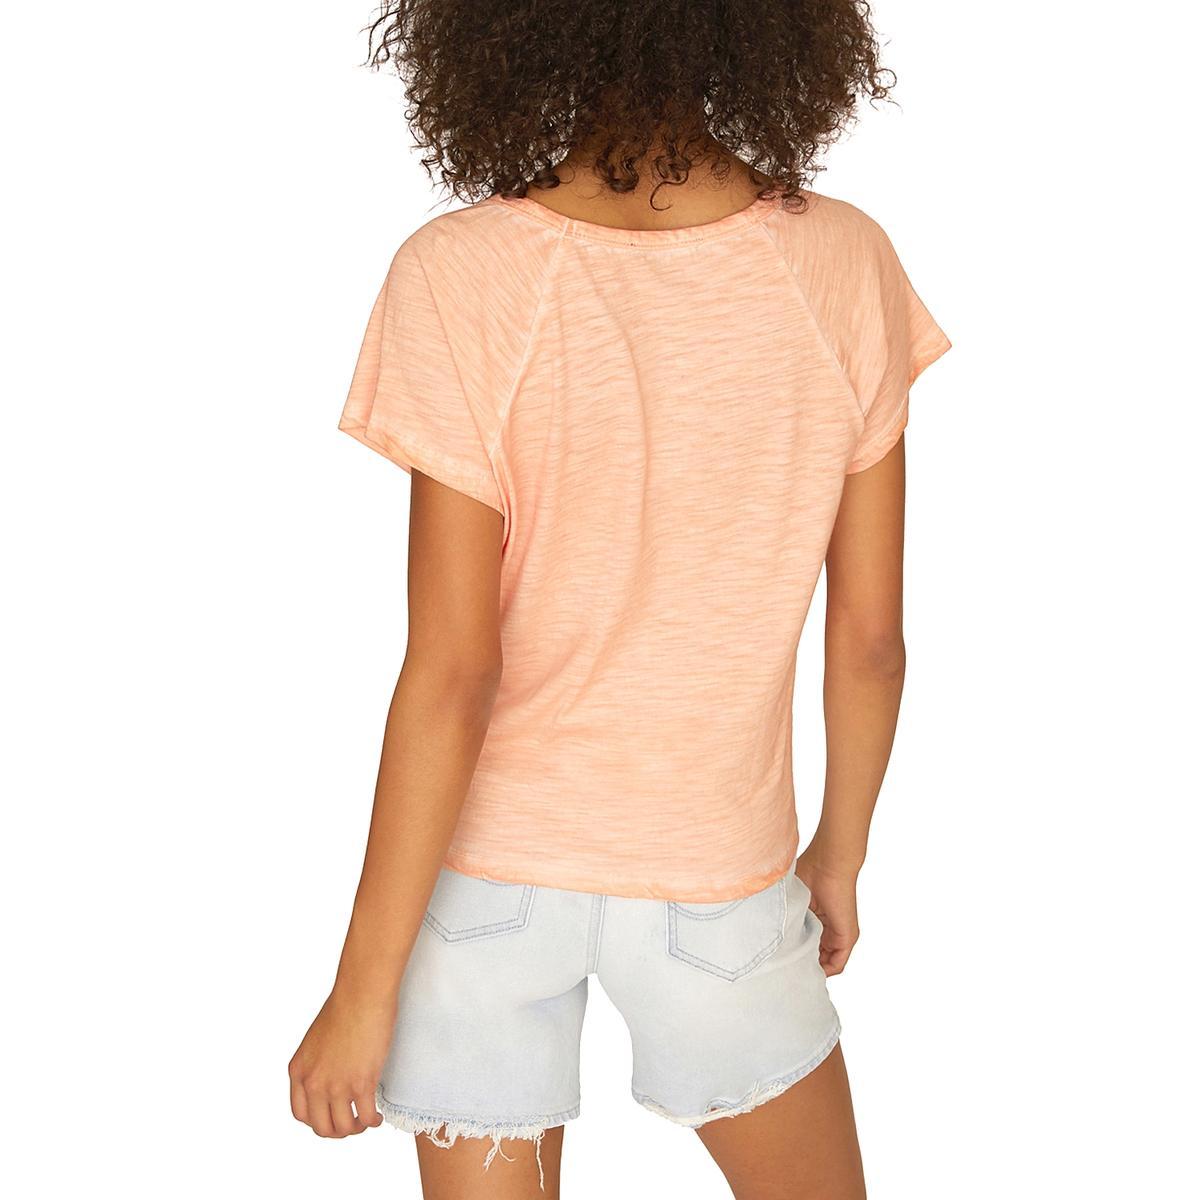 Sanctuary Womens Lou Orange Tie-Front Short Sleeve Tee T-Shirt Top XS BHFO 5712